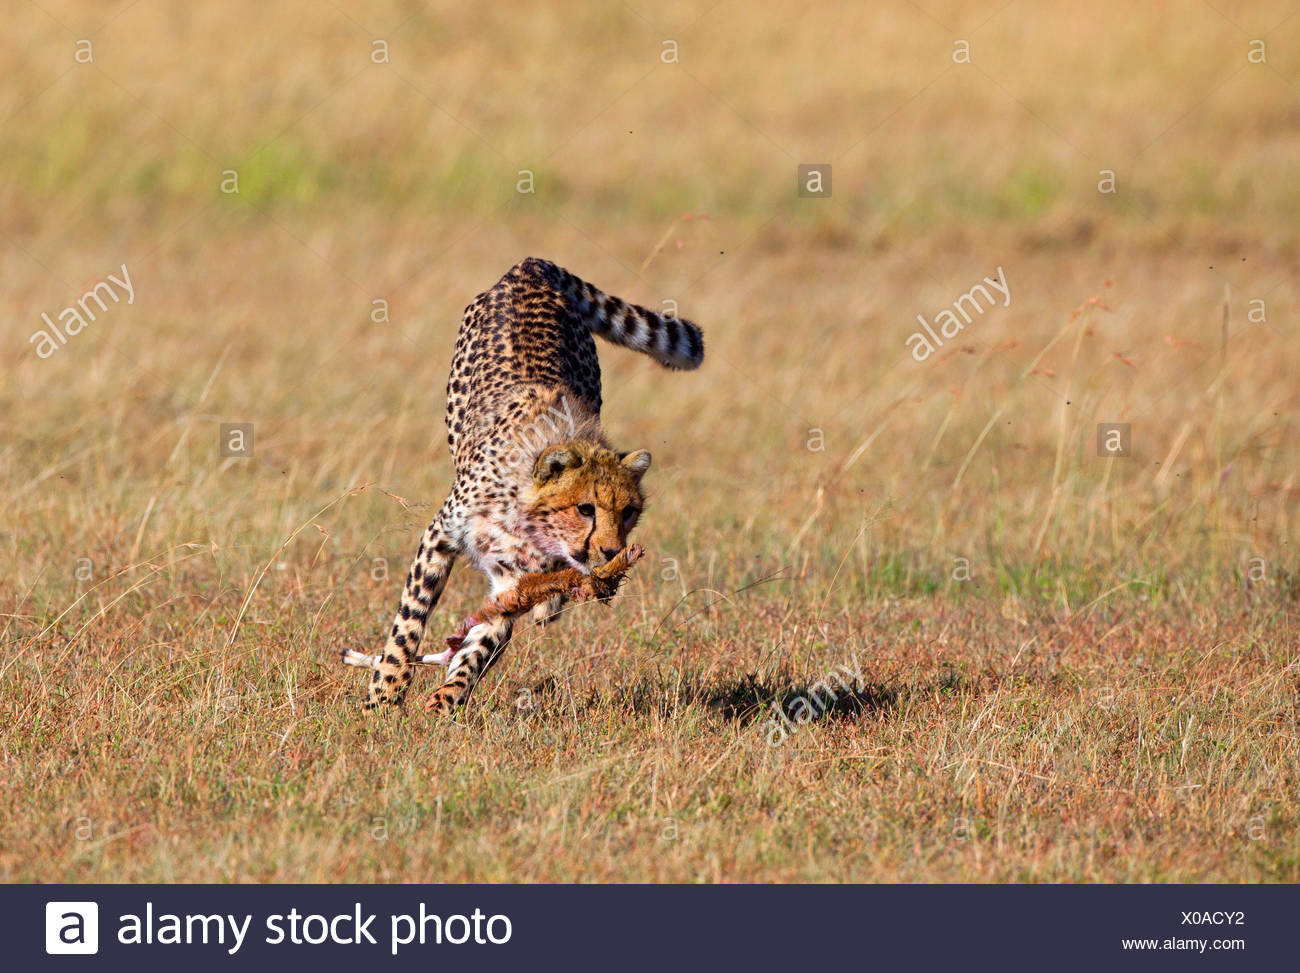 Guepardo (Acinonyx jubatus), huye con parte de un cadáver en su boca, Kenia, Masai Mara National Park Imagen De Stock